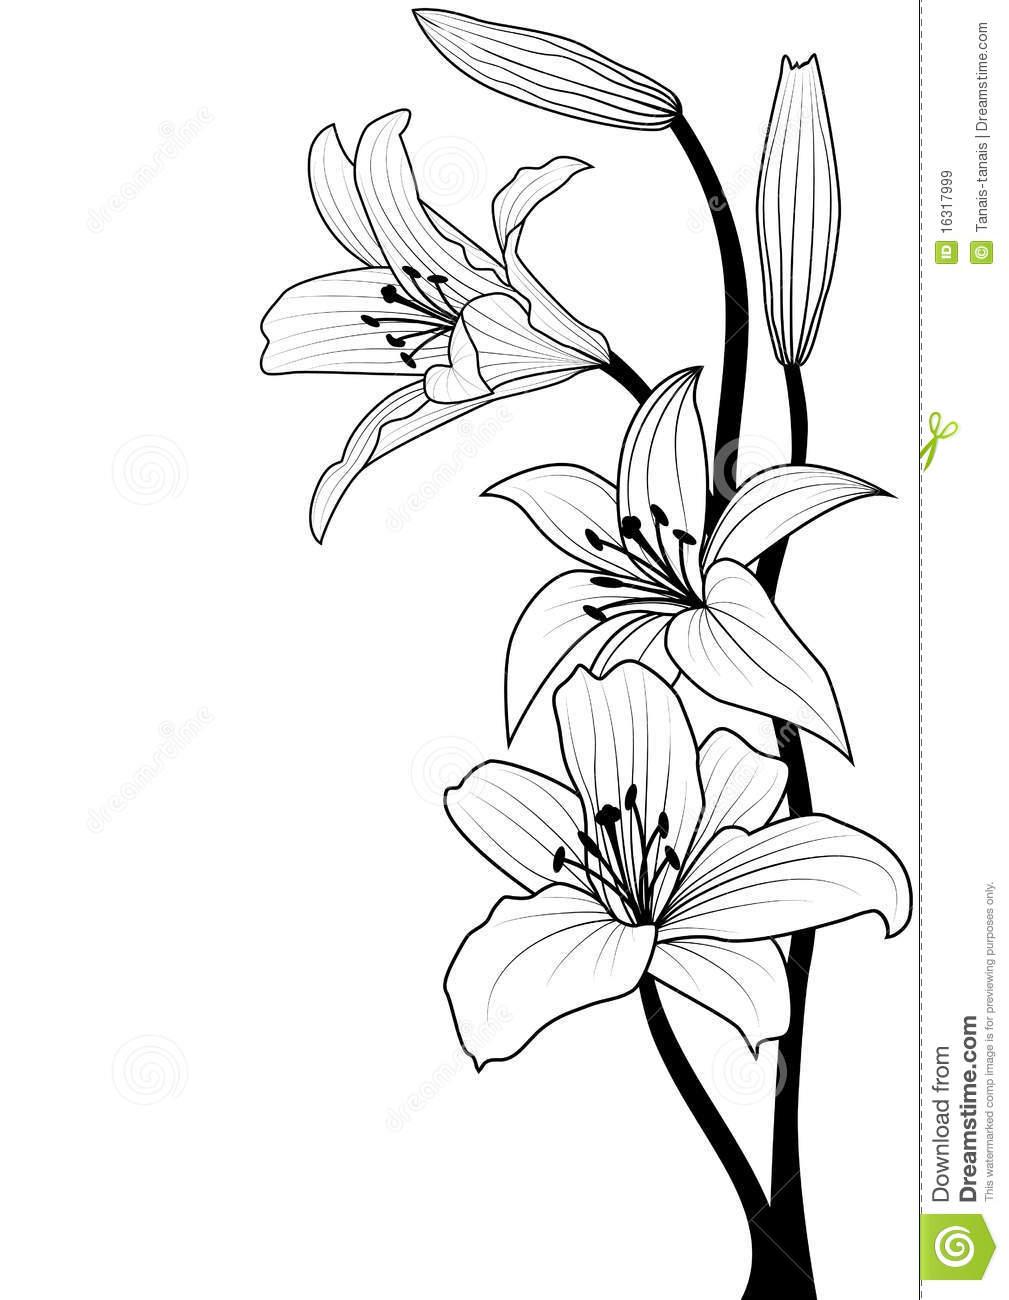 1009x1300 Drawn Lily Line Drawing